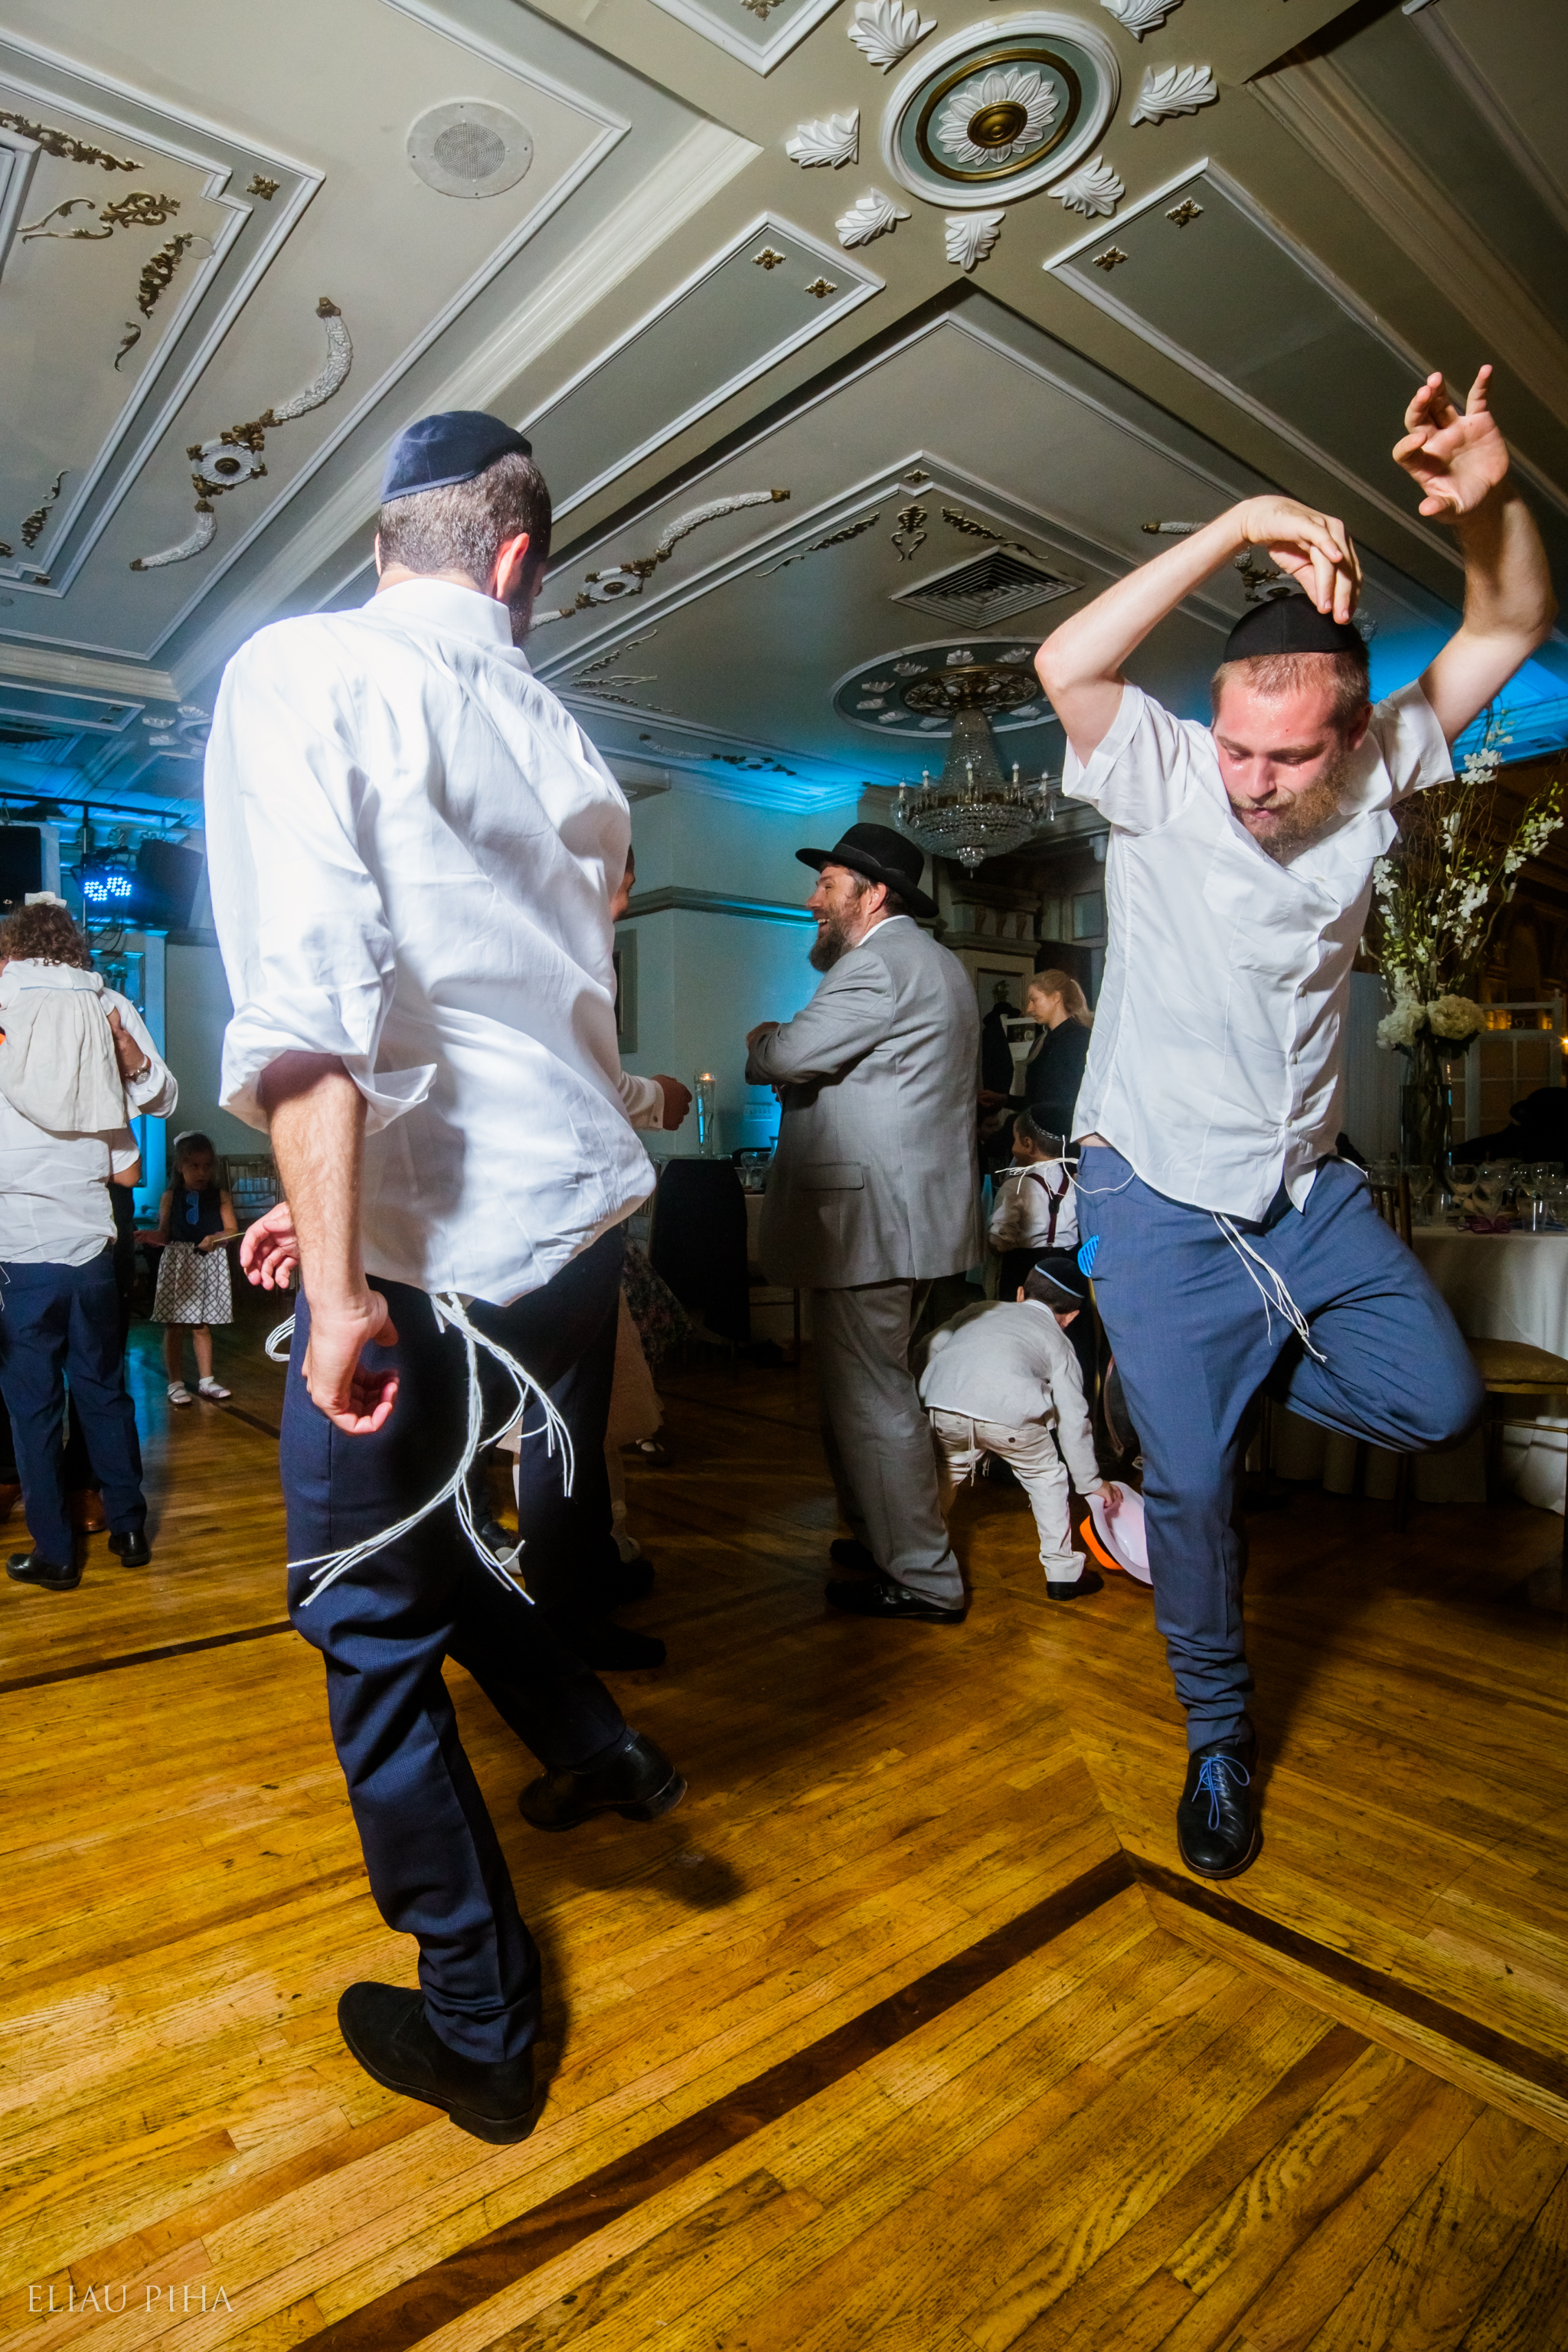 Bar Mitzvah Meir Sandman - photography, new york, events, people -0509.jpg